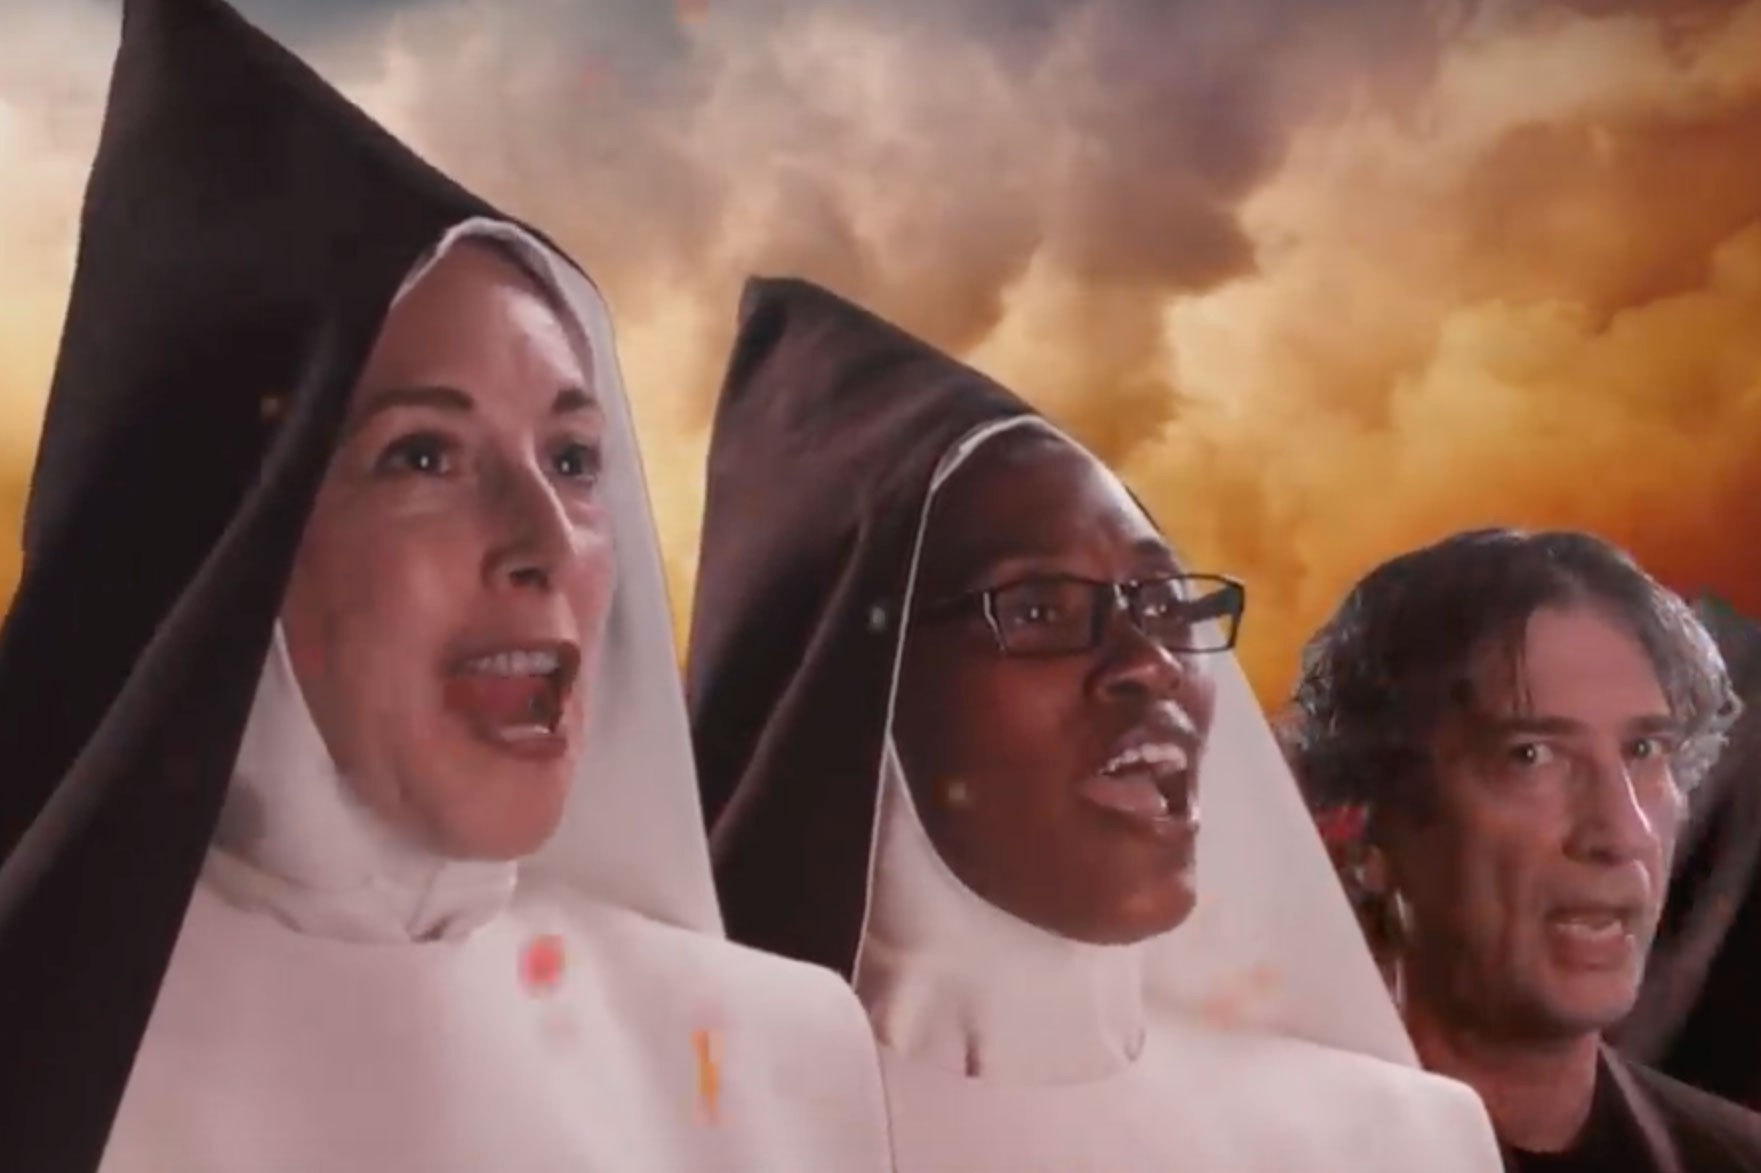 Good Omens The Chattering Order of St. Beryl (screenshot, FC)